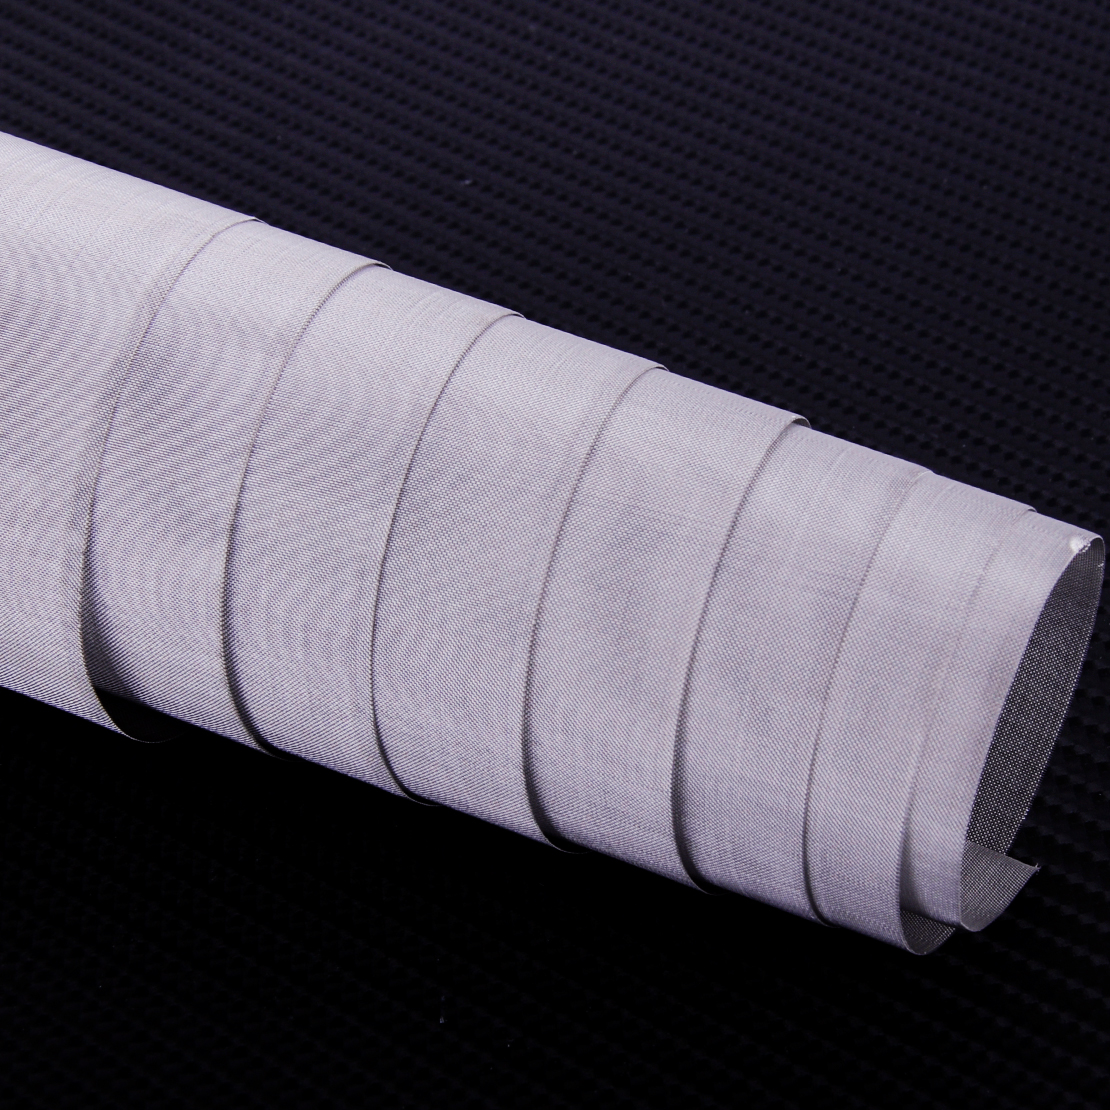 100 Mesh Edelstahl Filter Gaze Drahtfilter Filtergewebe Filtergewebe 122x 30.5cm